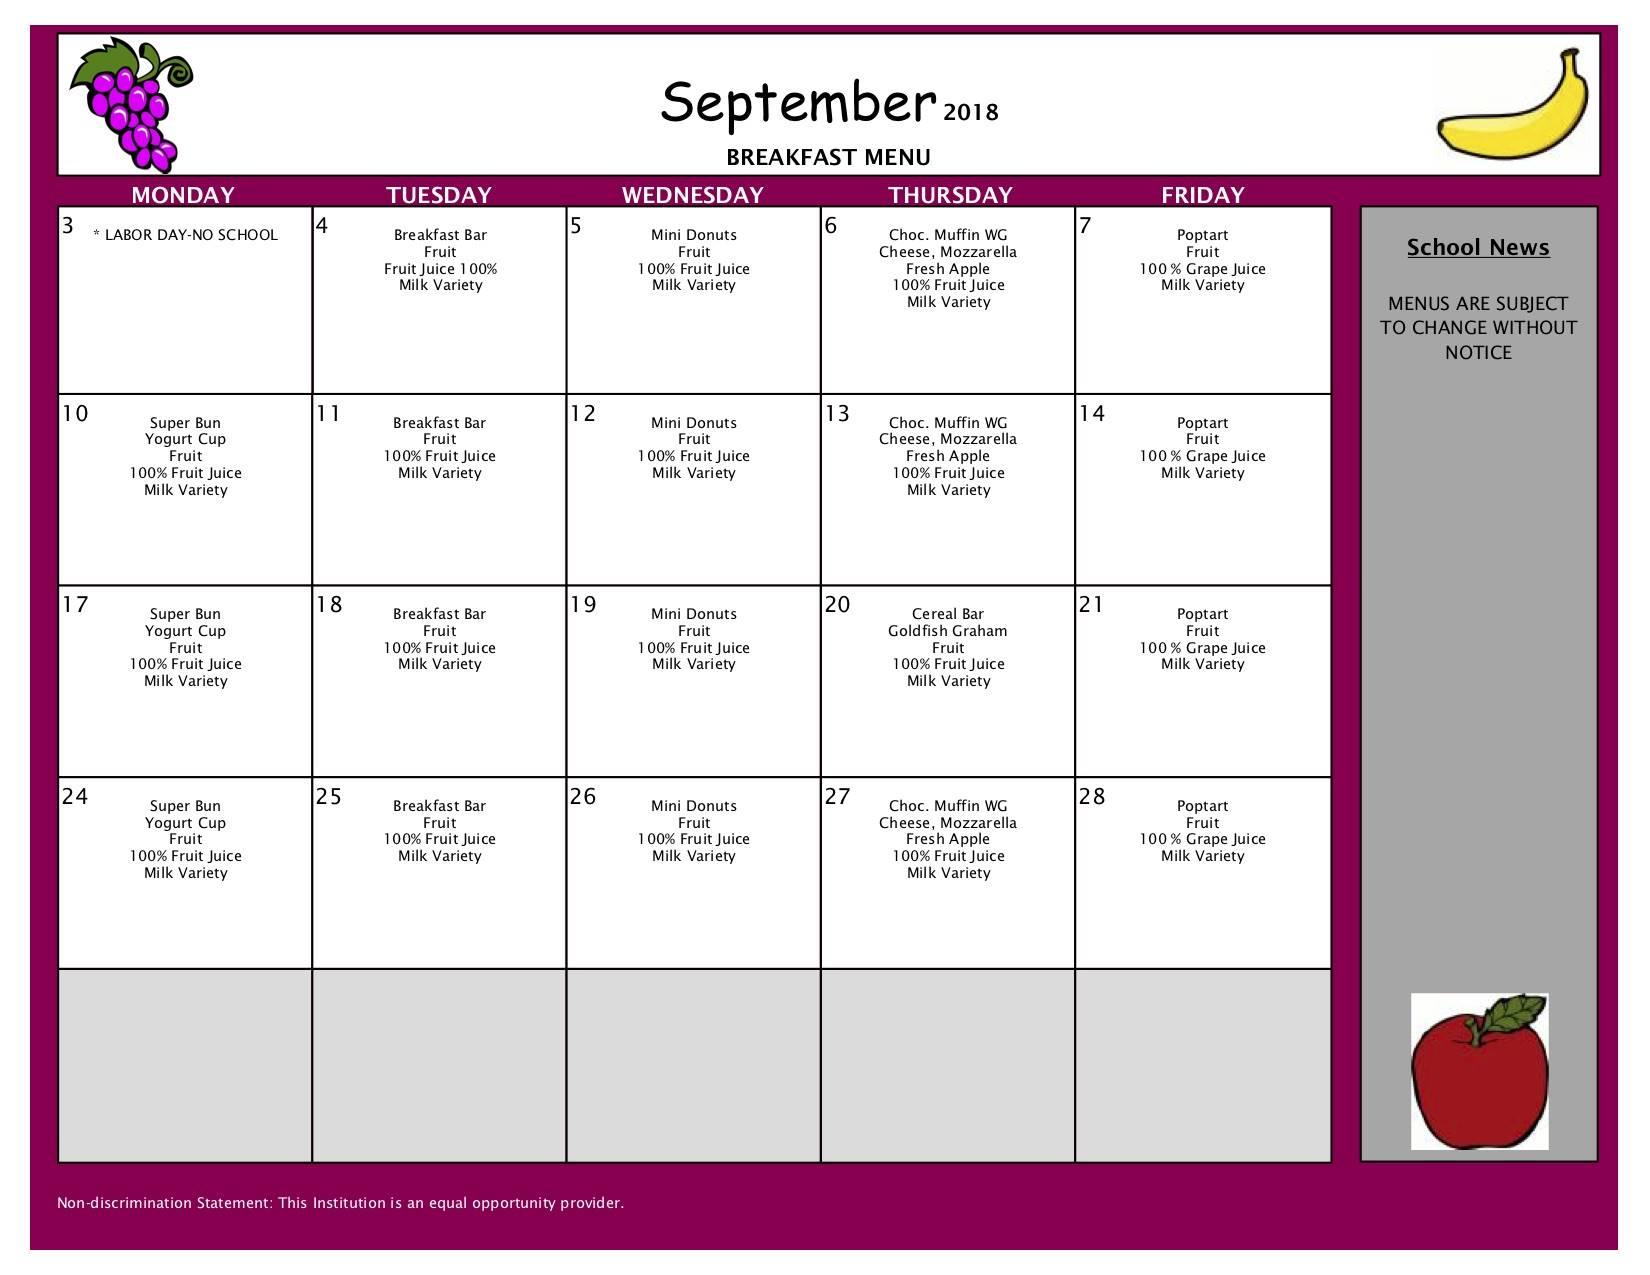 September Breakfast Menu - High School